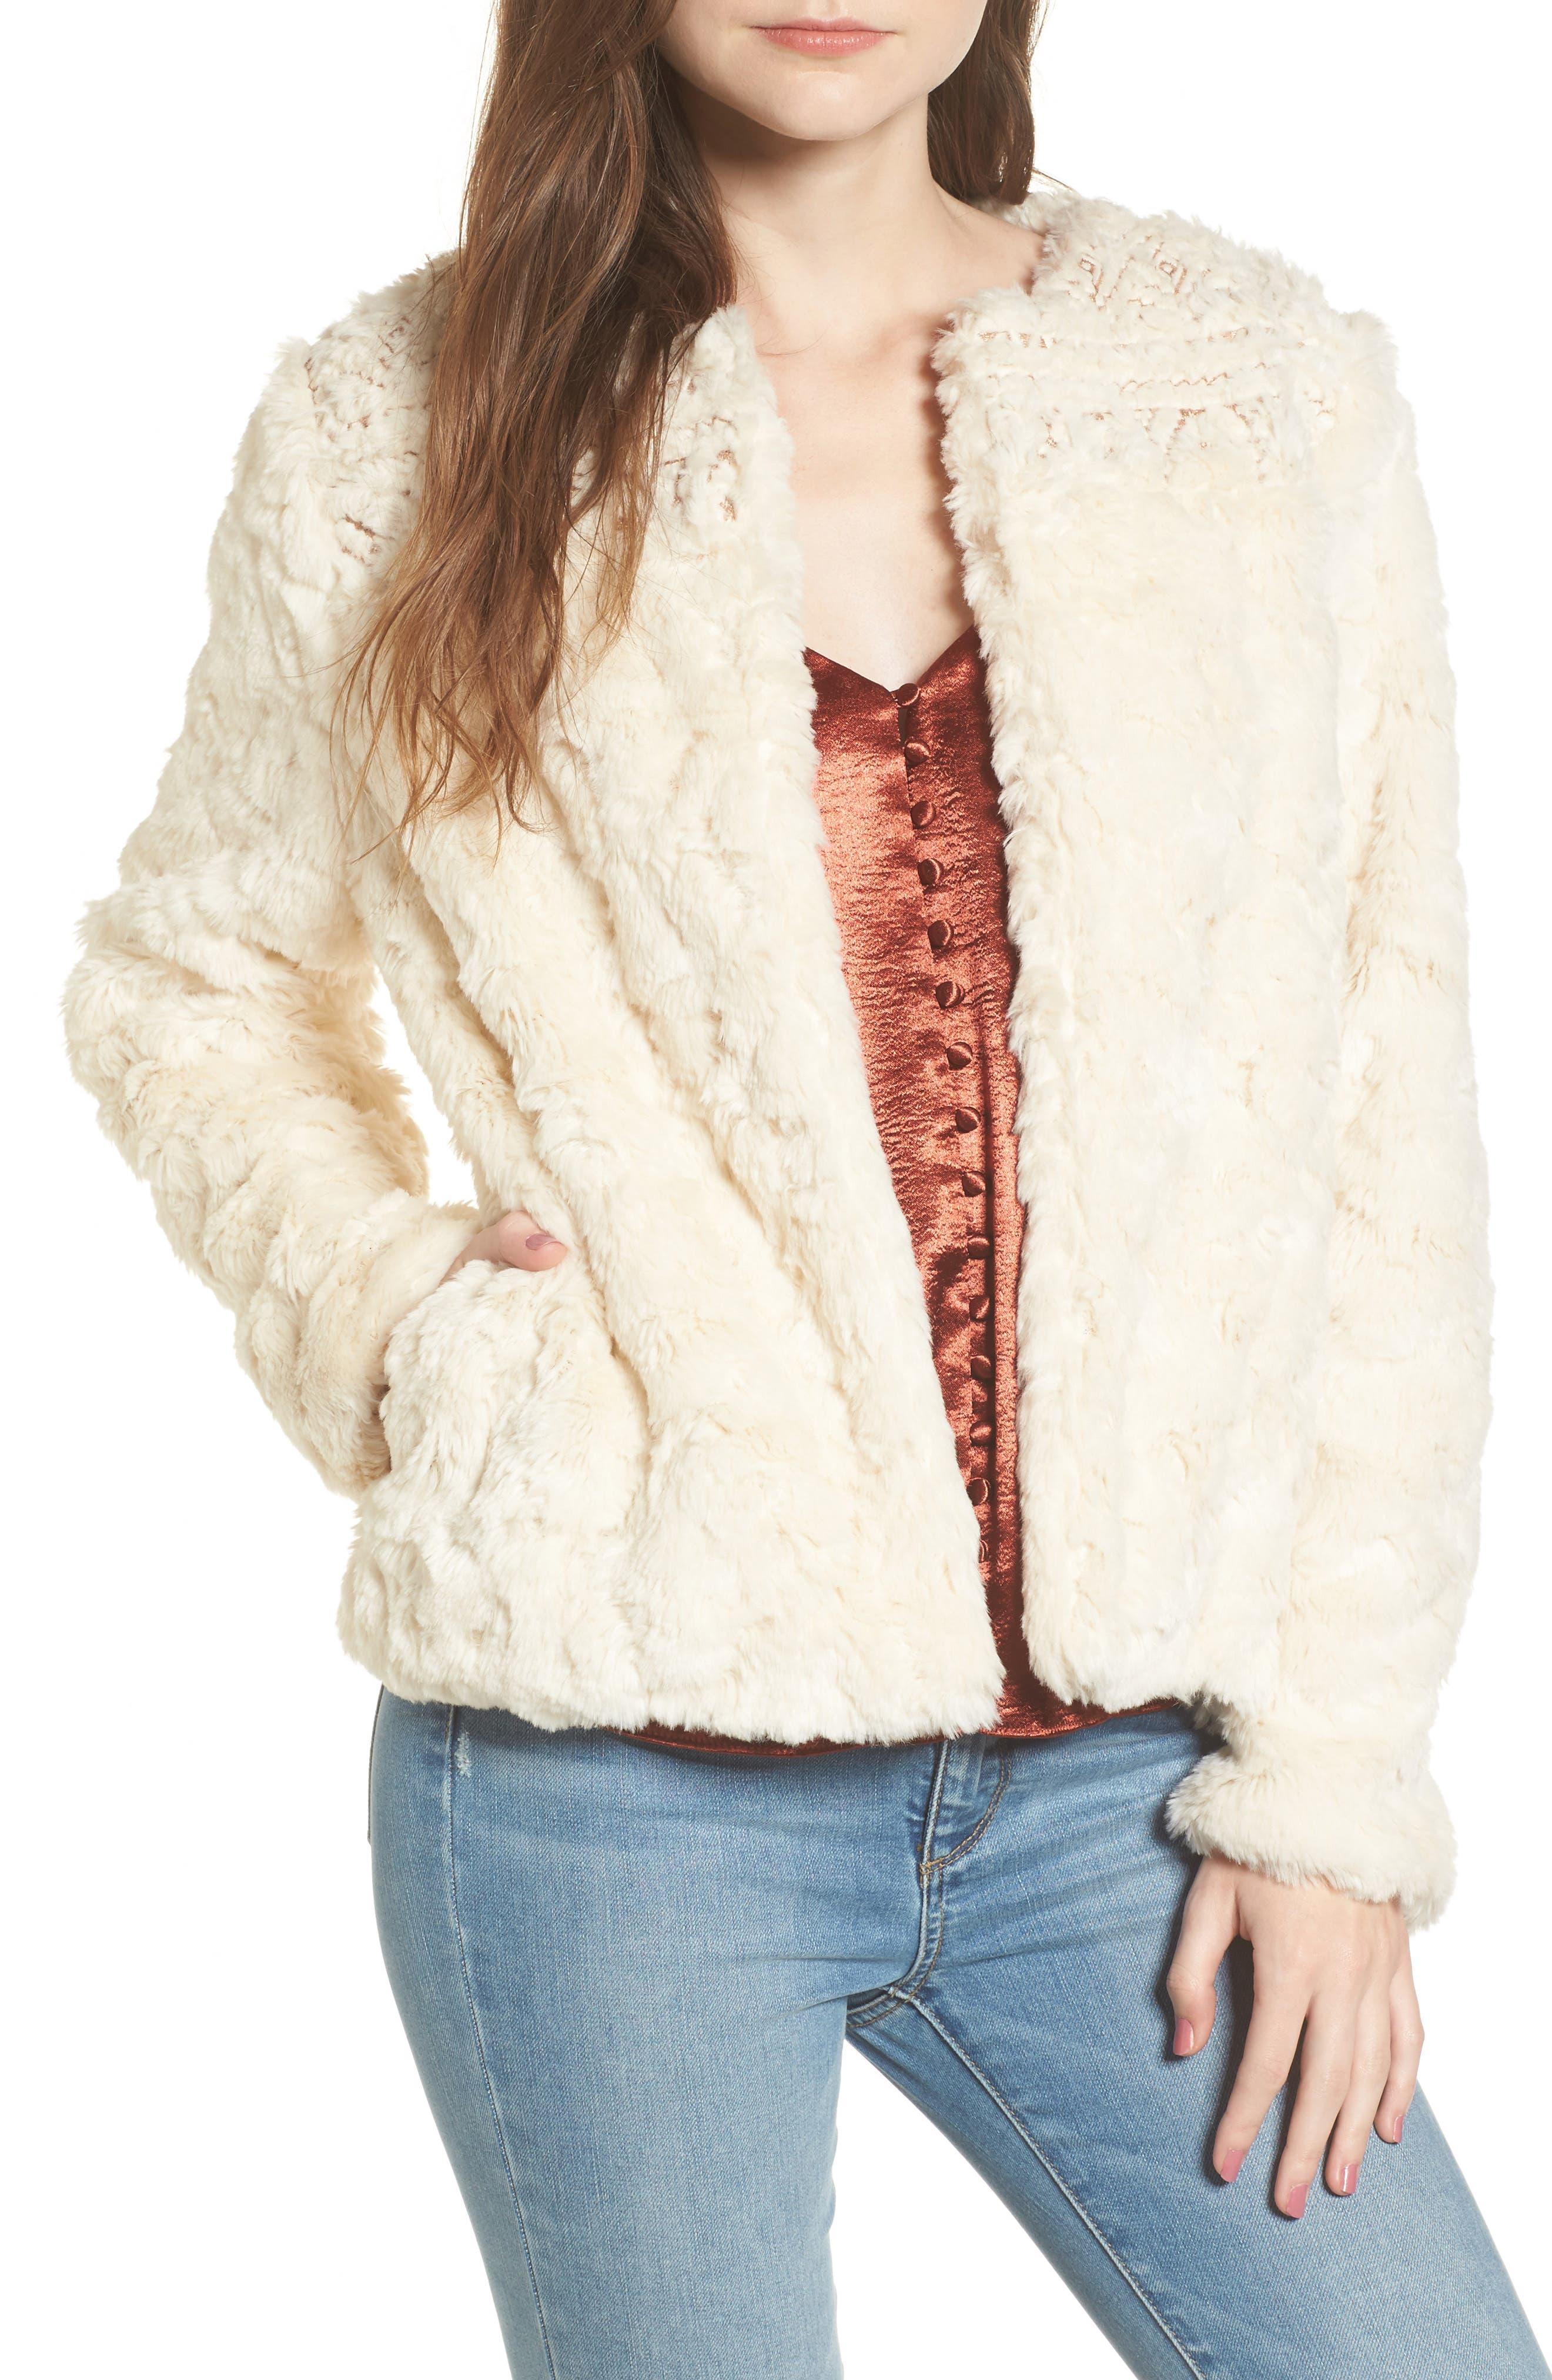 Metallic Embroidery Faux Fur Jacket,                         Main,                         color,